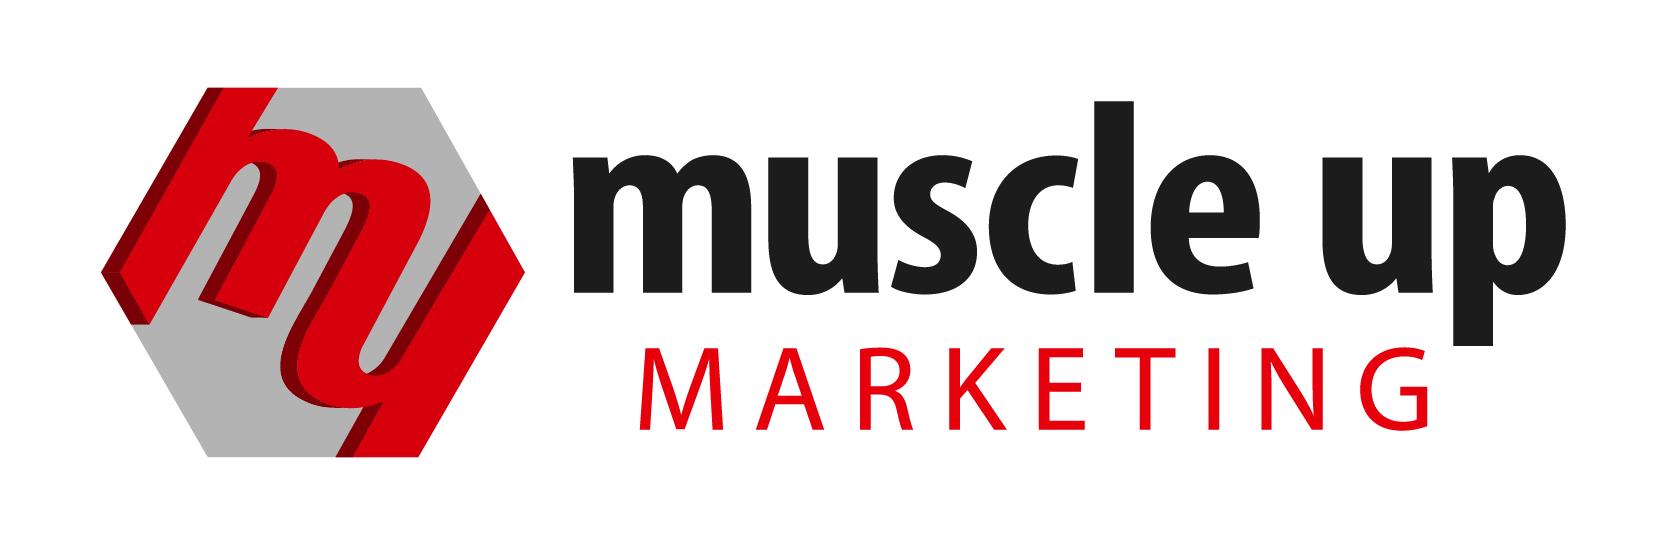 muscleup